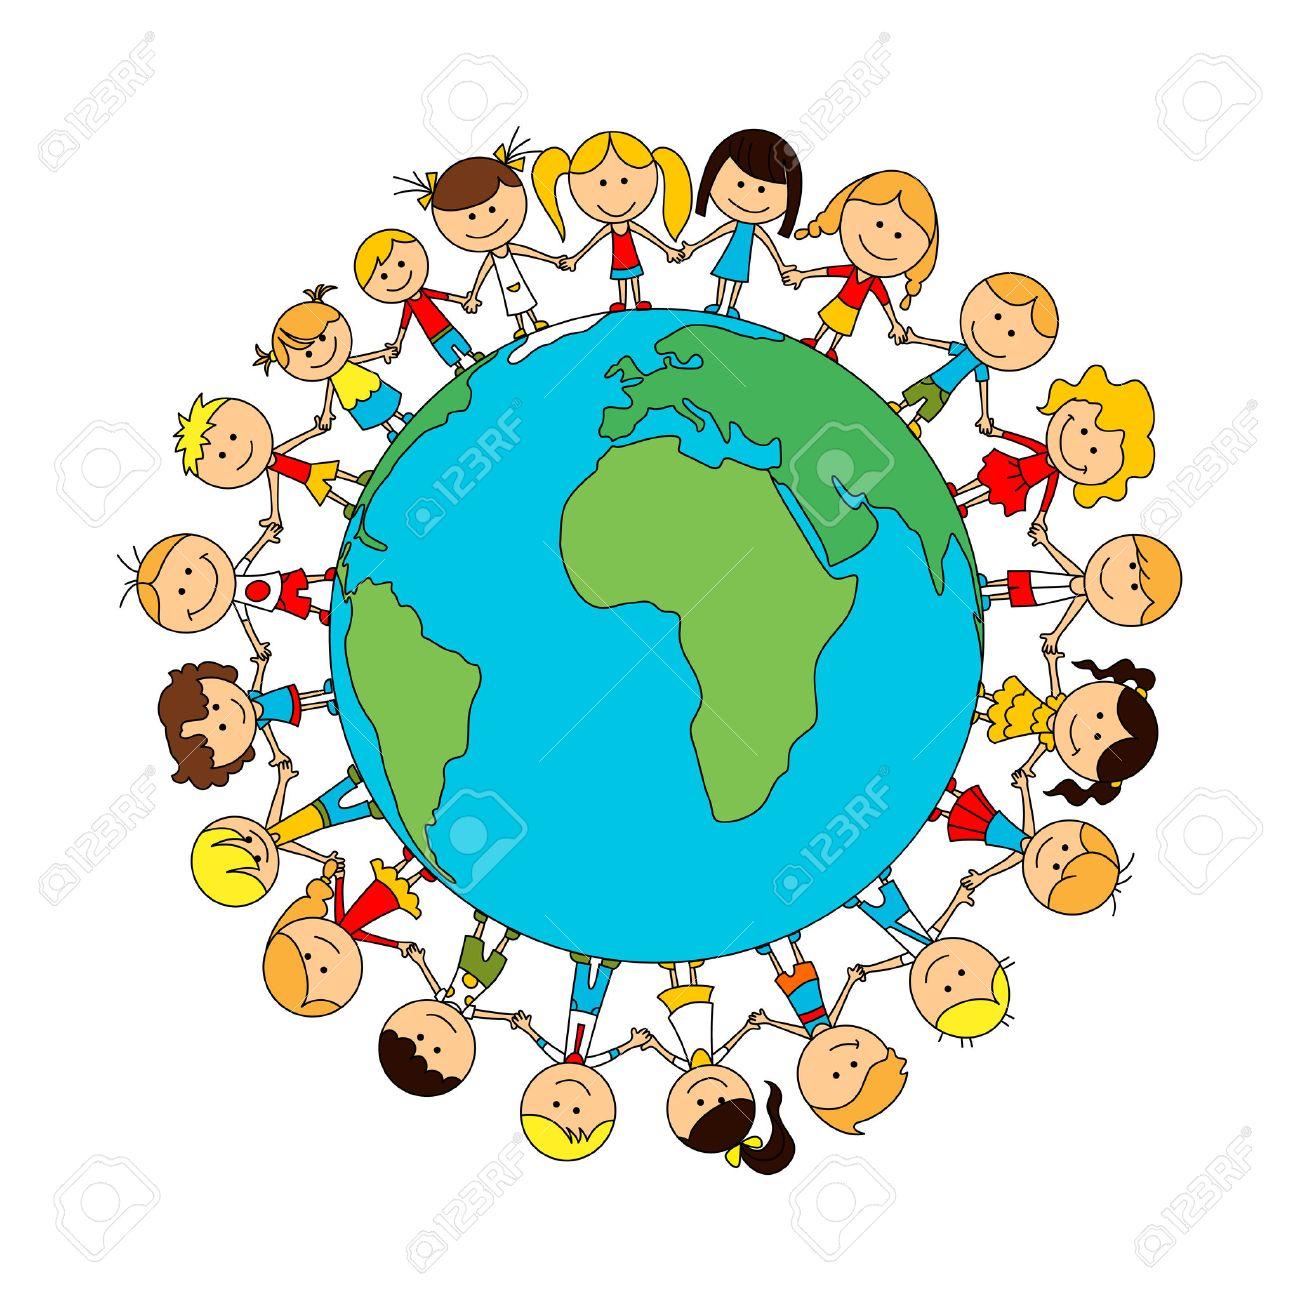 Children world friendship cartoon poster. Happy smiling kids around globe. Child unity and care concept vector symbol. Kindergarten boys and girls - 61616237